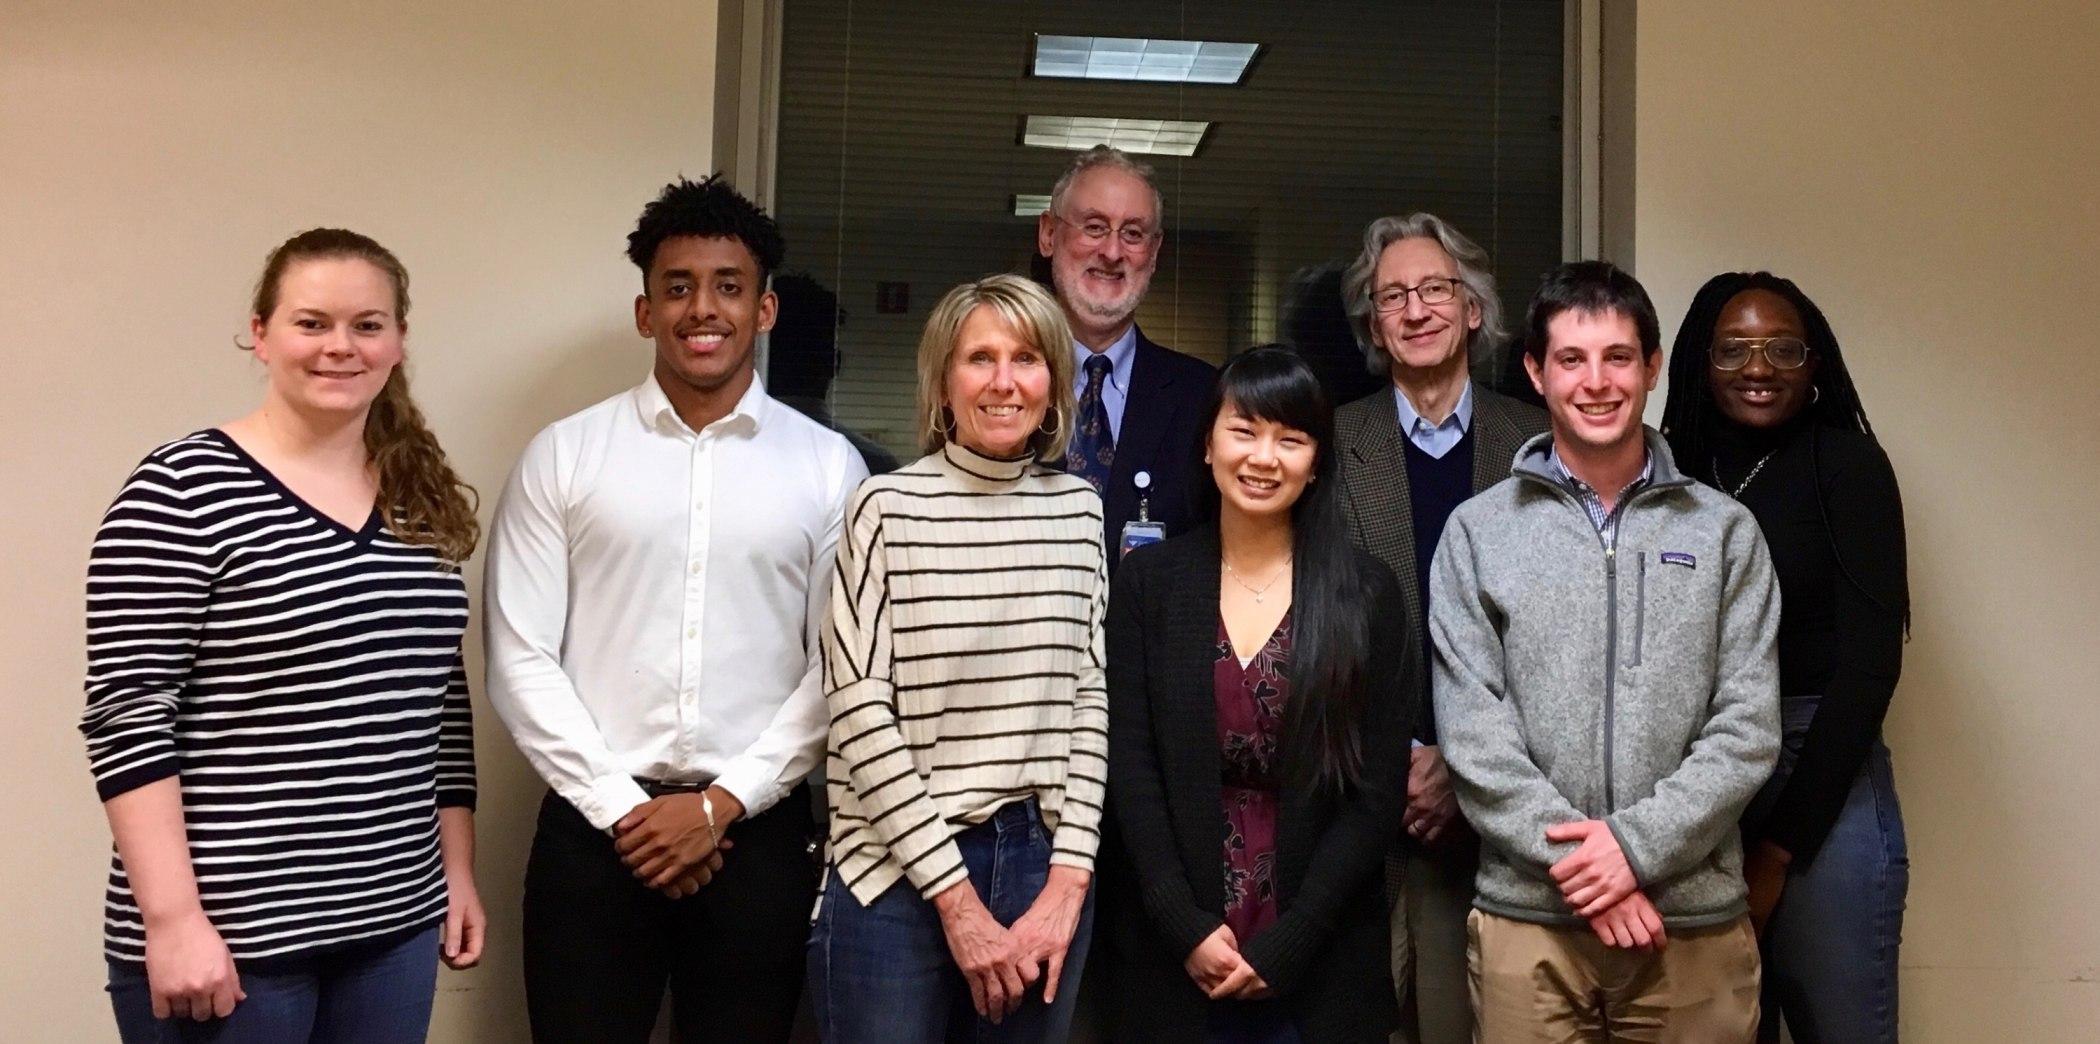 NHP student leaders and medical advisors, Front, from left to right: Alexandra Mountford (YSN '21), Kedous Mekbib (YSM '22), Dr. Robin Whittemore (YSN), Kathy Doan (YSN '21), Daniel Jacobs (YSM '21), and Jessica Ainooson (YSPH '22). Back, from left to right: Dr. Paul Genecin (YSM) and Dr. Jeffrey Bender (YSM).